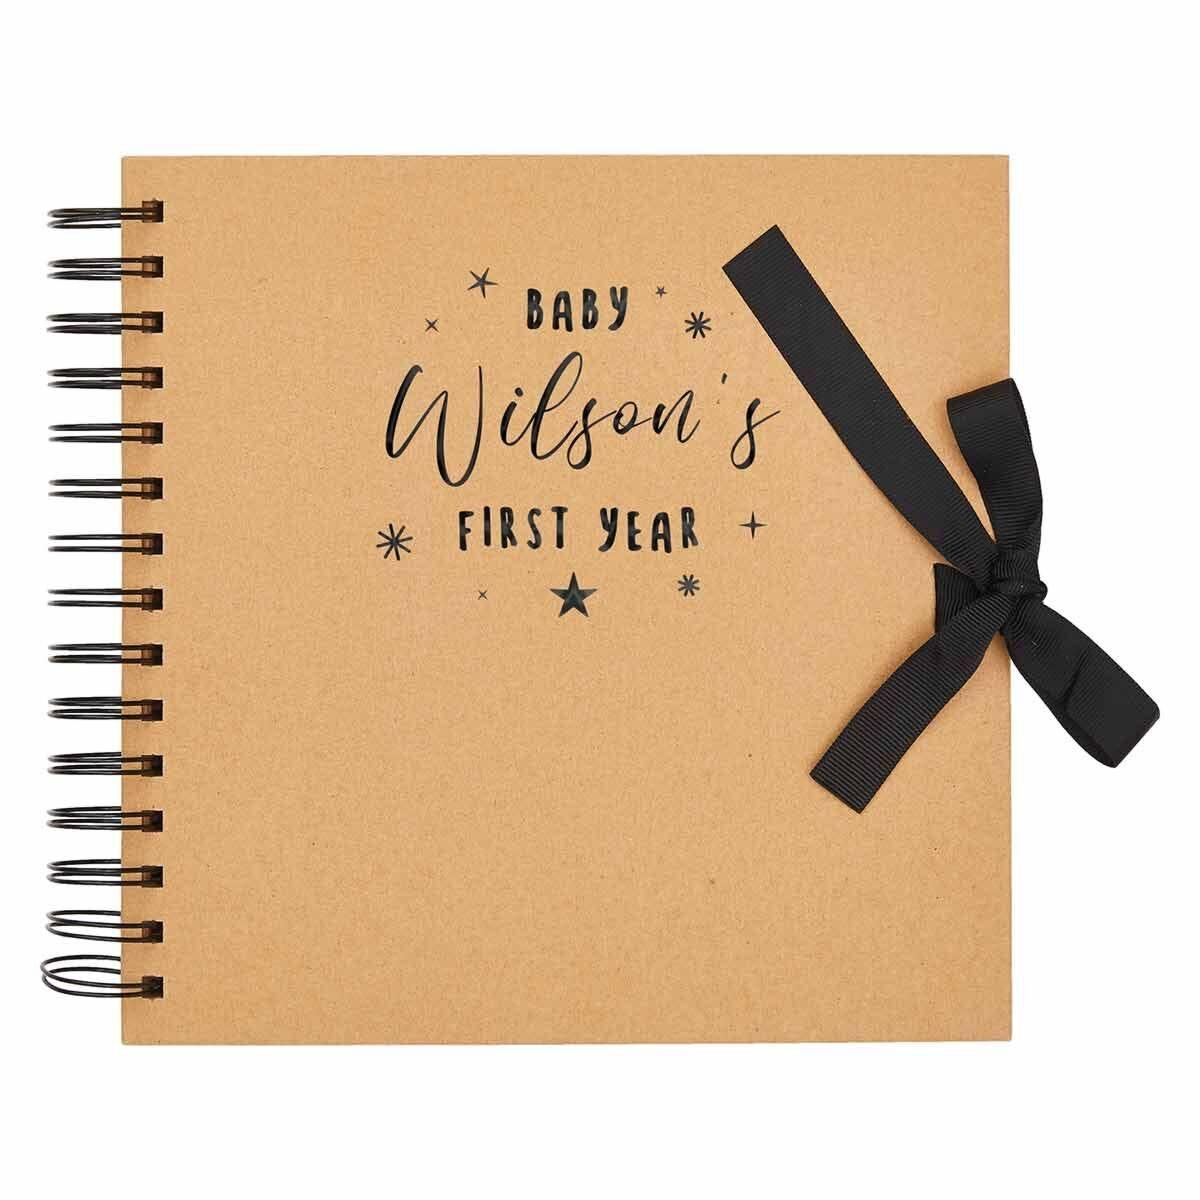 Personalised Scrapbook 8x8 First Year Black Foil Kraft